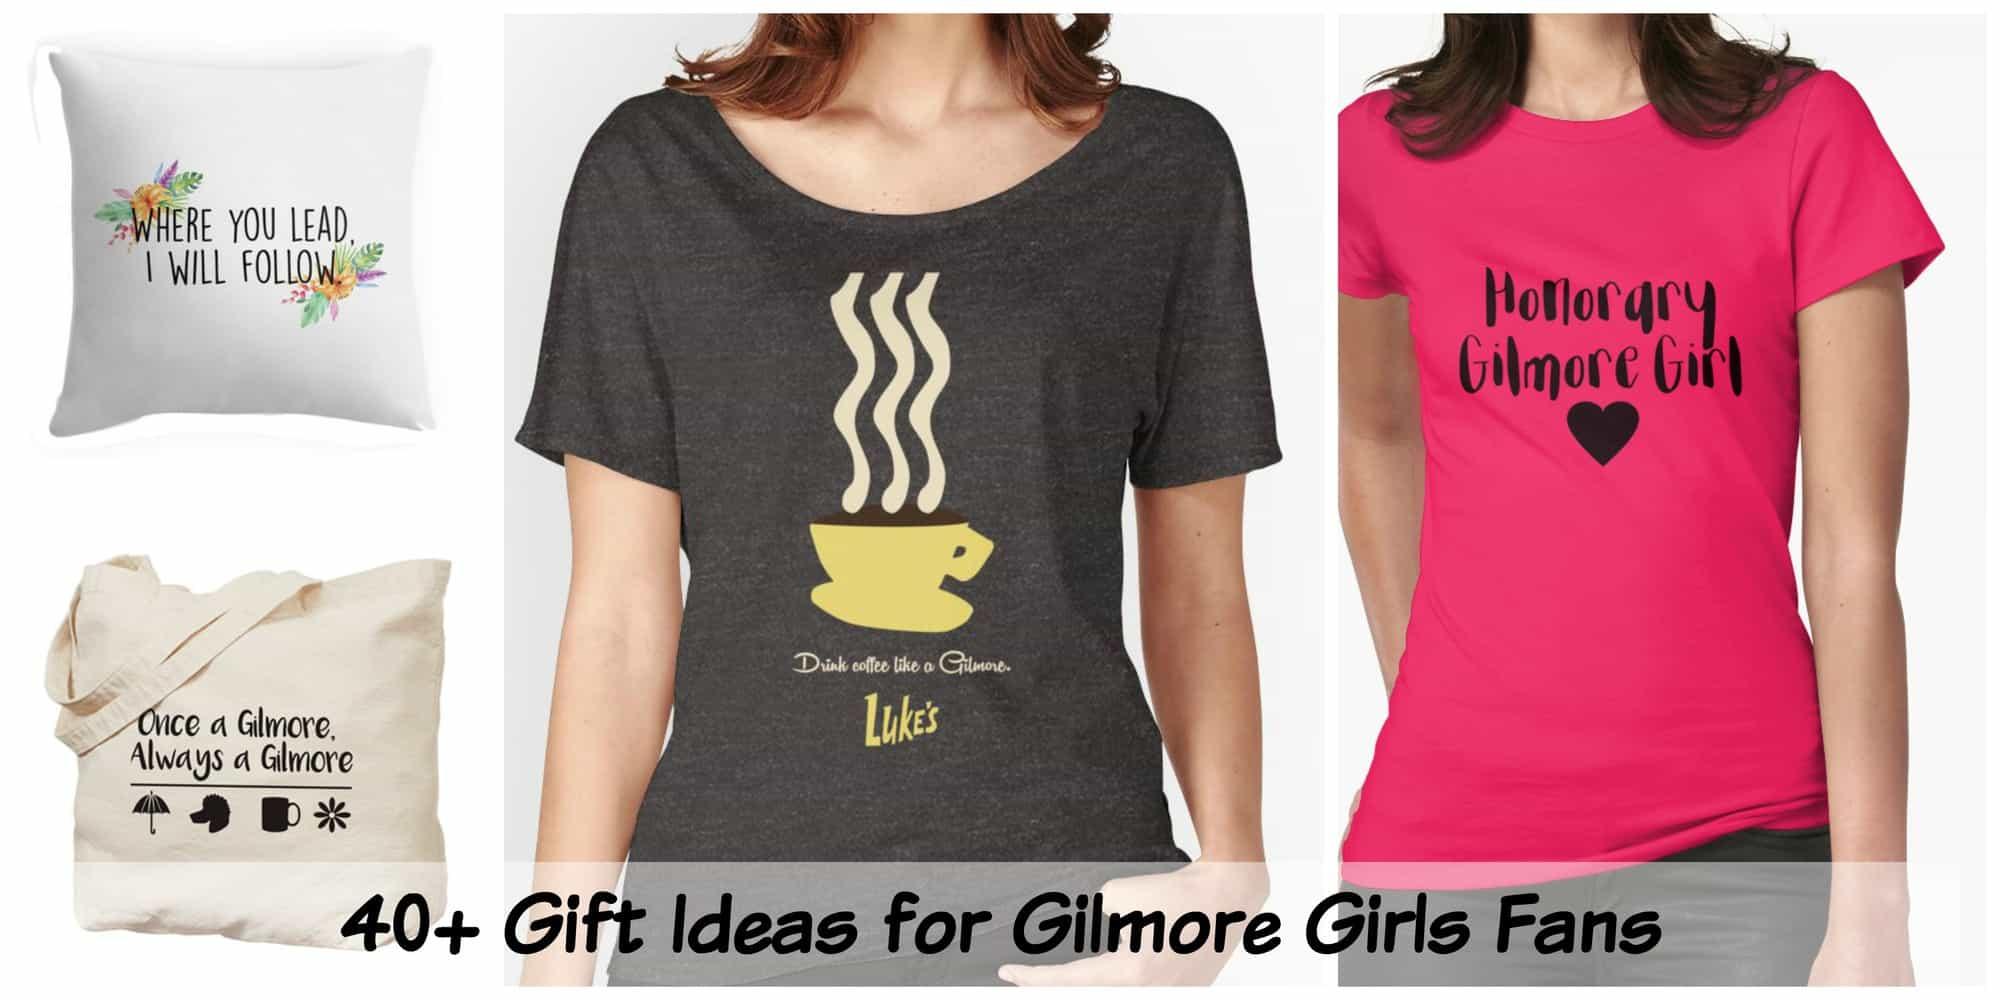 40+ Gift Ideas for Gilmore Girls Fans